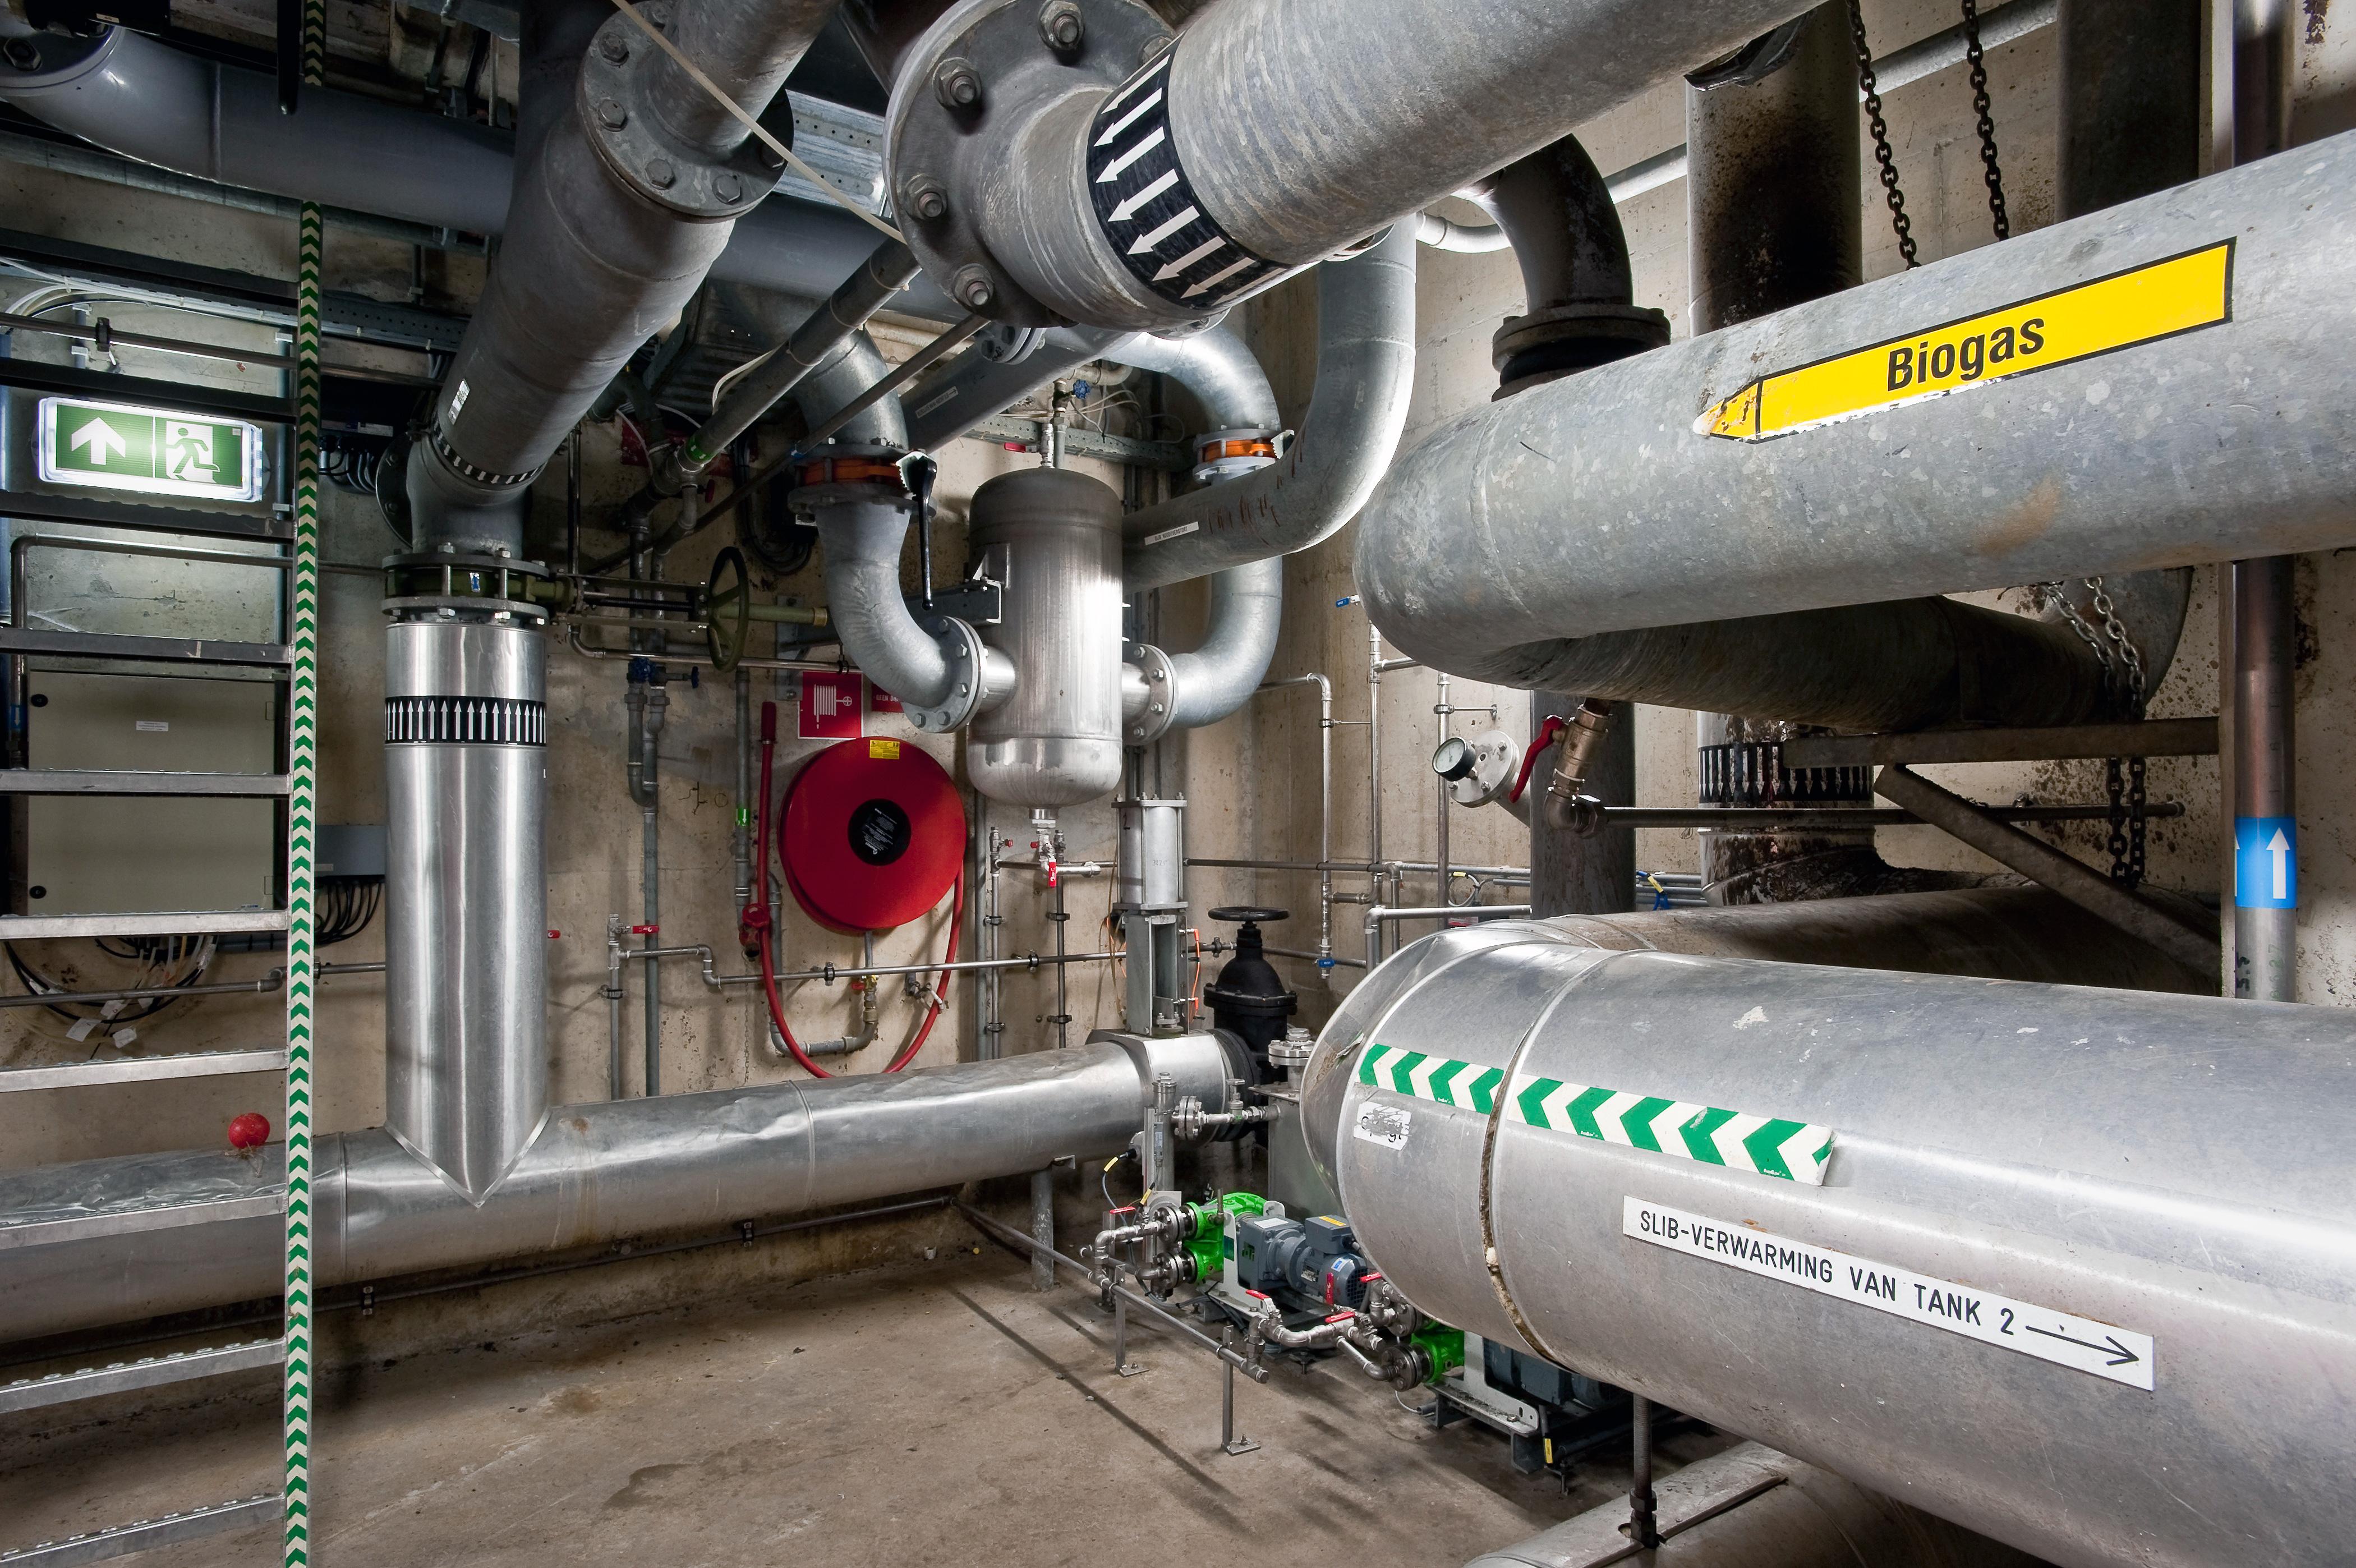 Energiefabriek - productieruimte biogas